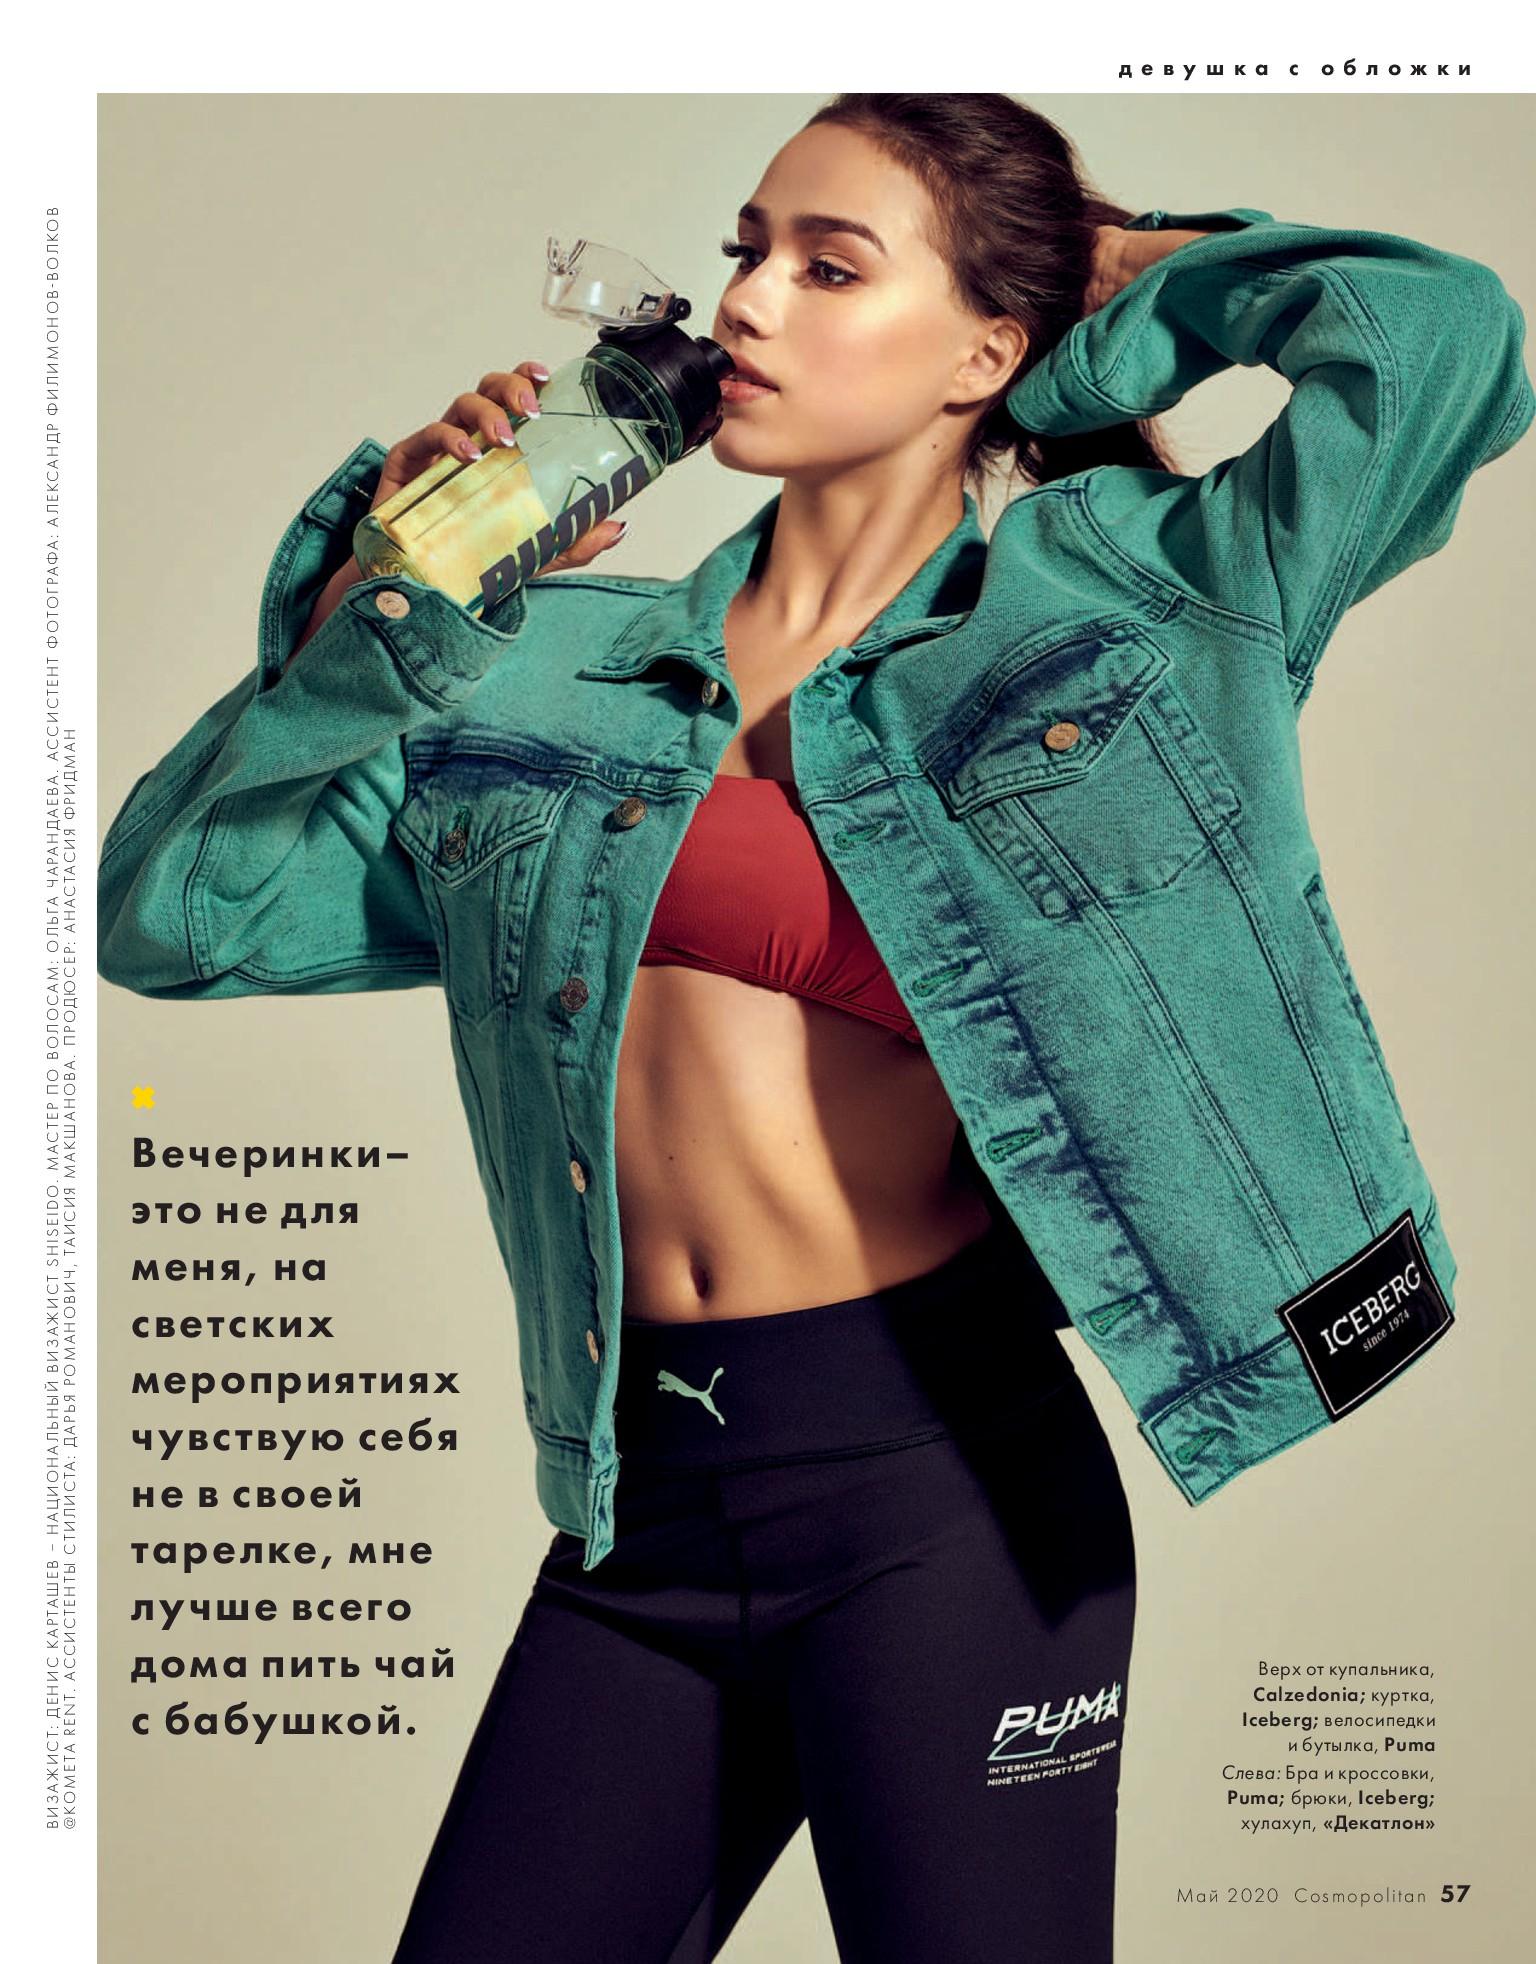 Алина Ильназовна Загитова-3 | Олимпийская чемпионка - Страница 6 5NgQ-KdxxZA